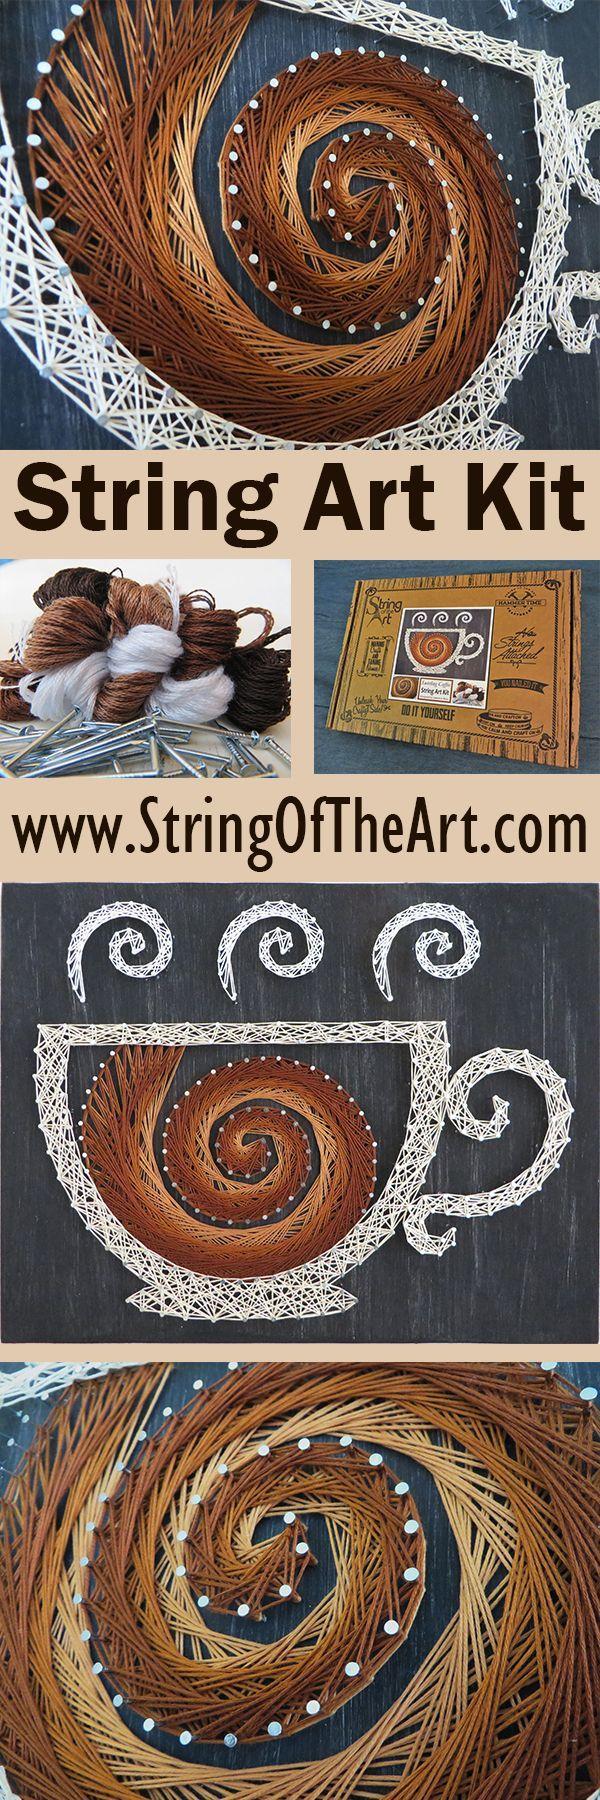 DIY Projects: Swirling Coffee Kit